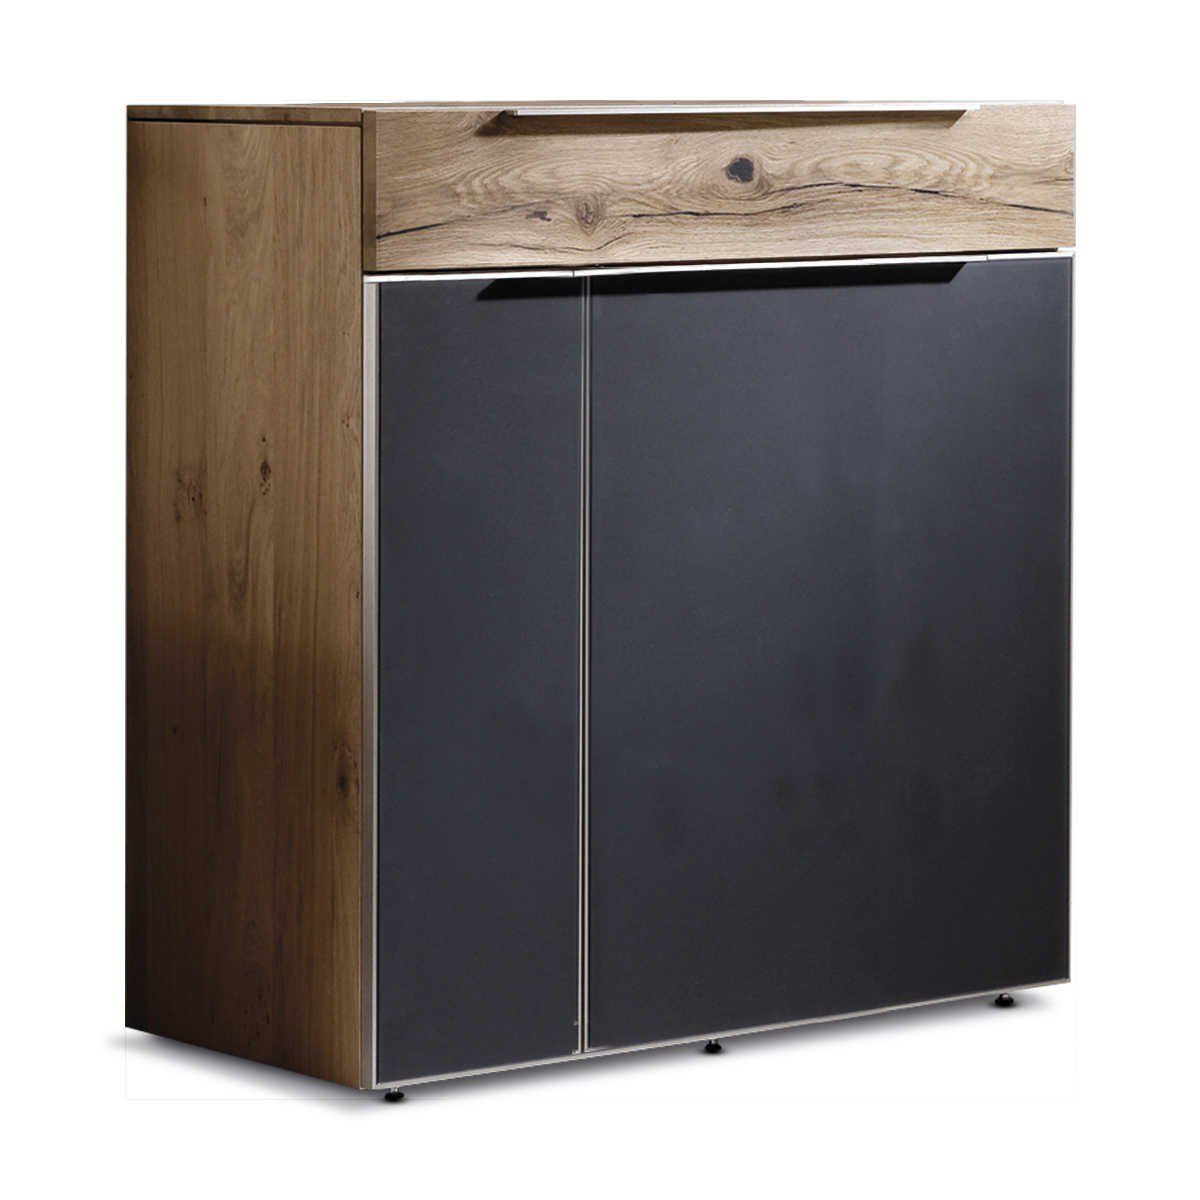 voglauer kommode v alpin eiche holz glas online kaufen bei eiche holz eiche und kommode. Black Bedroom Furniture Sets. Home Design Ideas